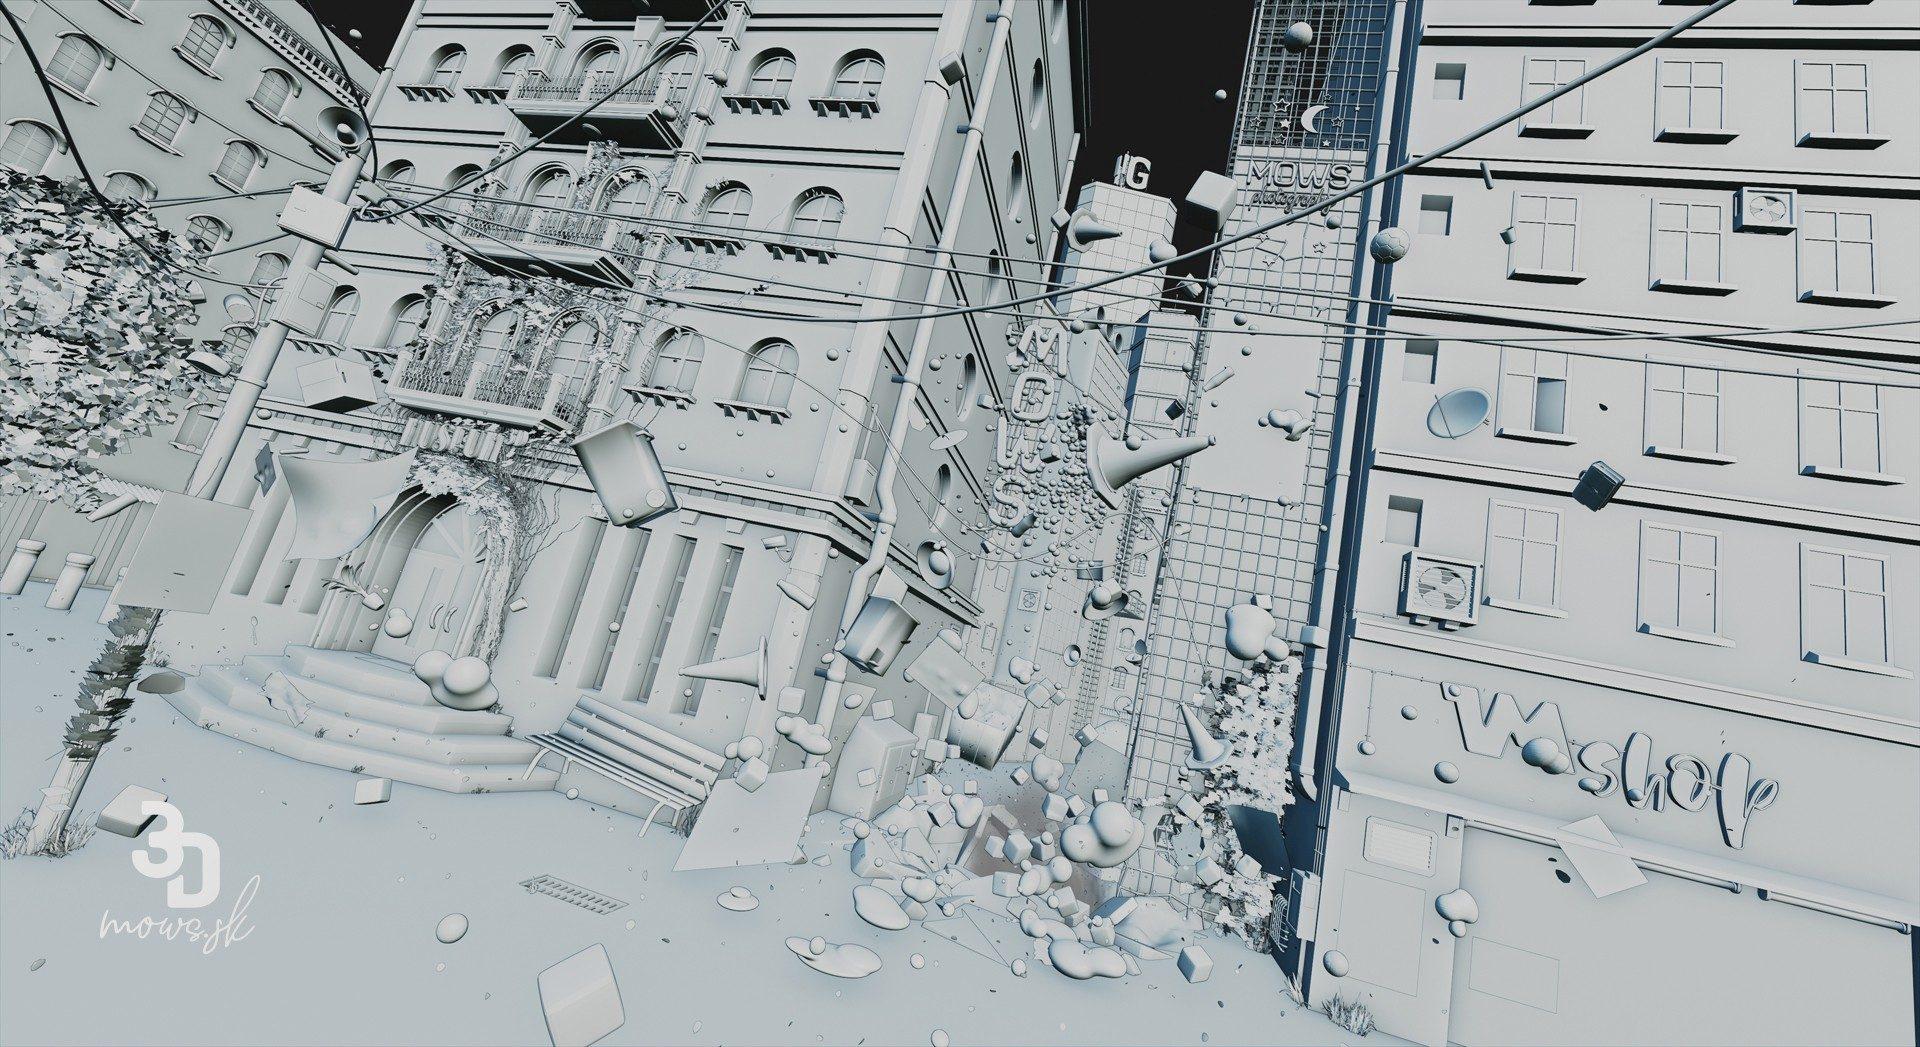 Ulica bez textúr a svetiel renderovaná cez Workbench